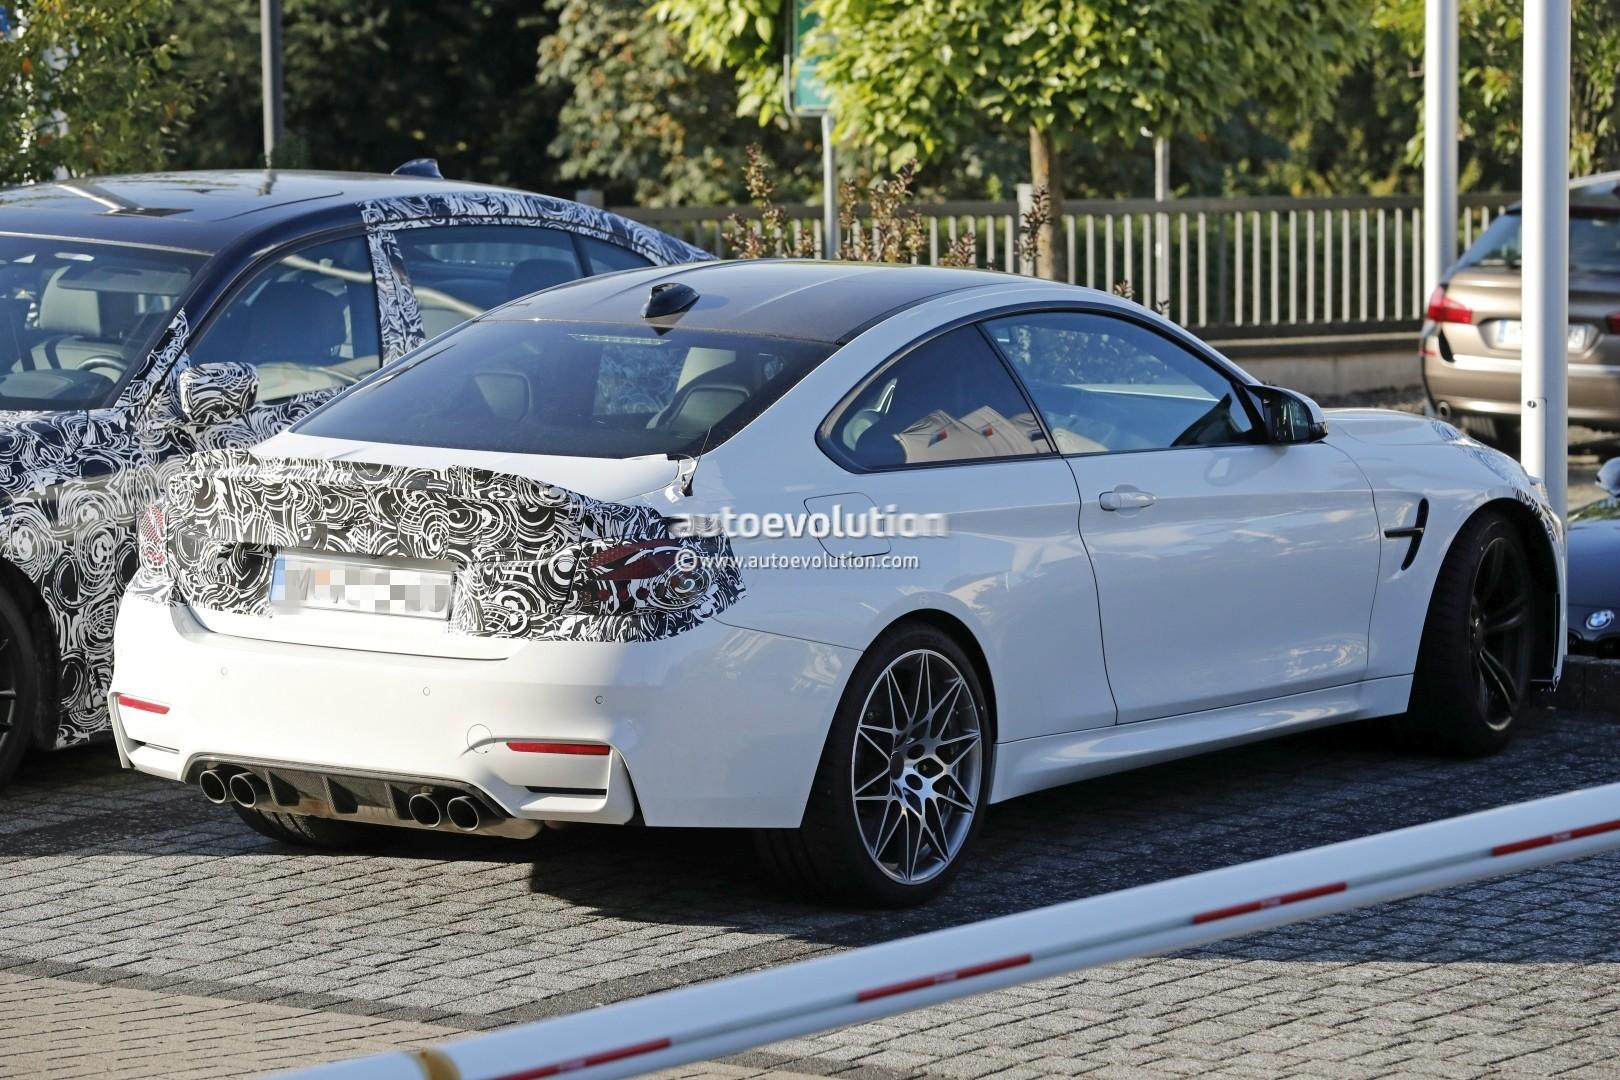 2014 - [BMW] M3 & M4 [F80/F82/F83] - Page 24 2018-bmw-m4-facelift-cs-special-edition-spied-shows-aggressive-aerodynamics_12